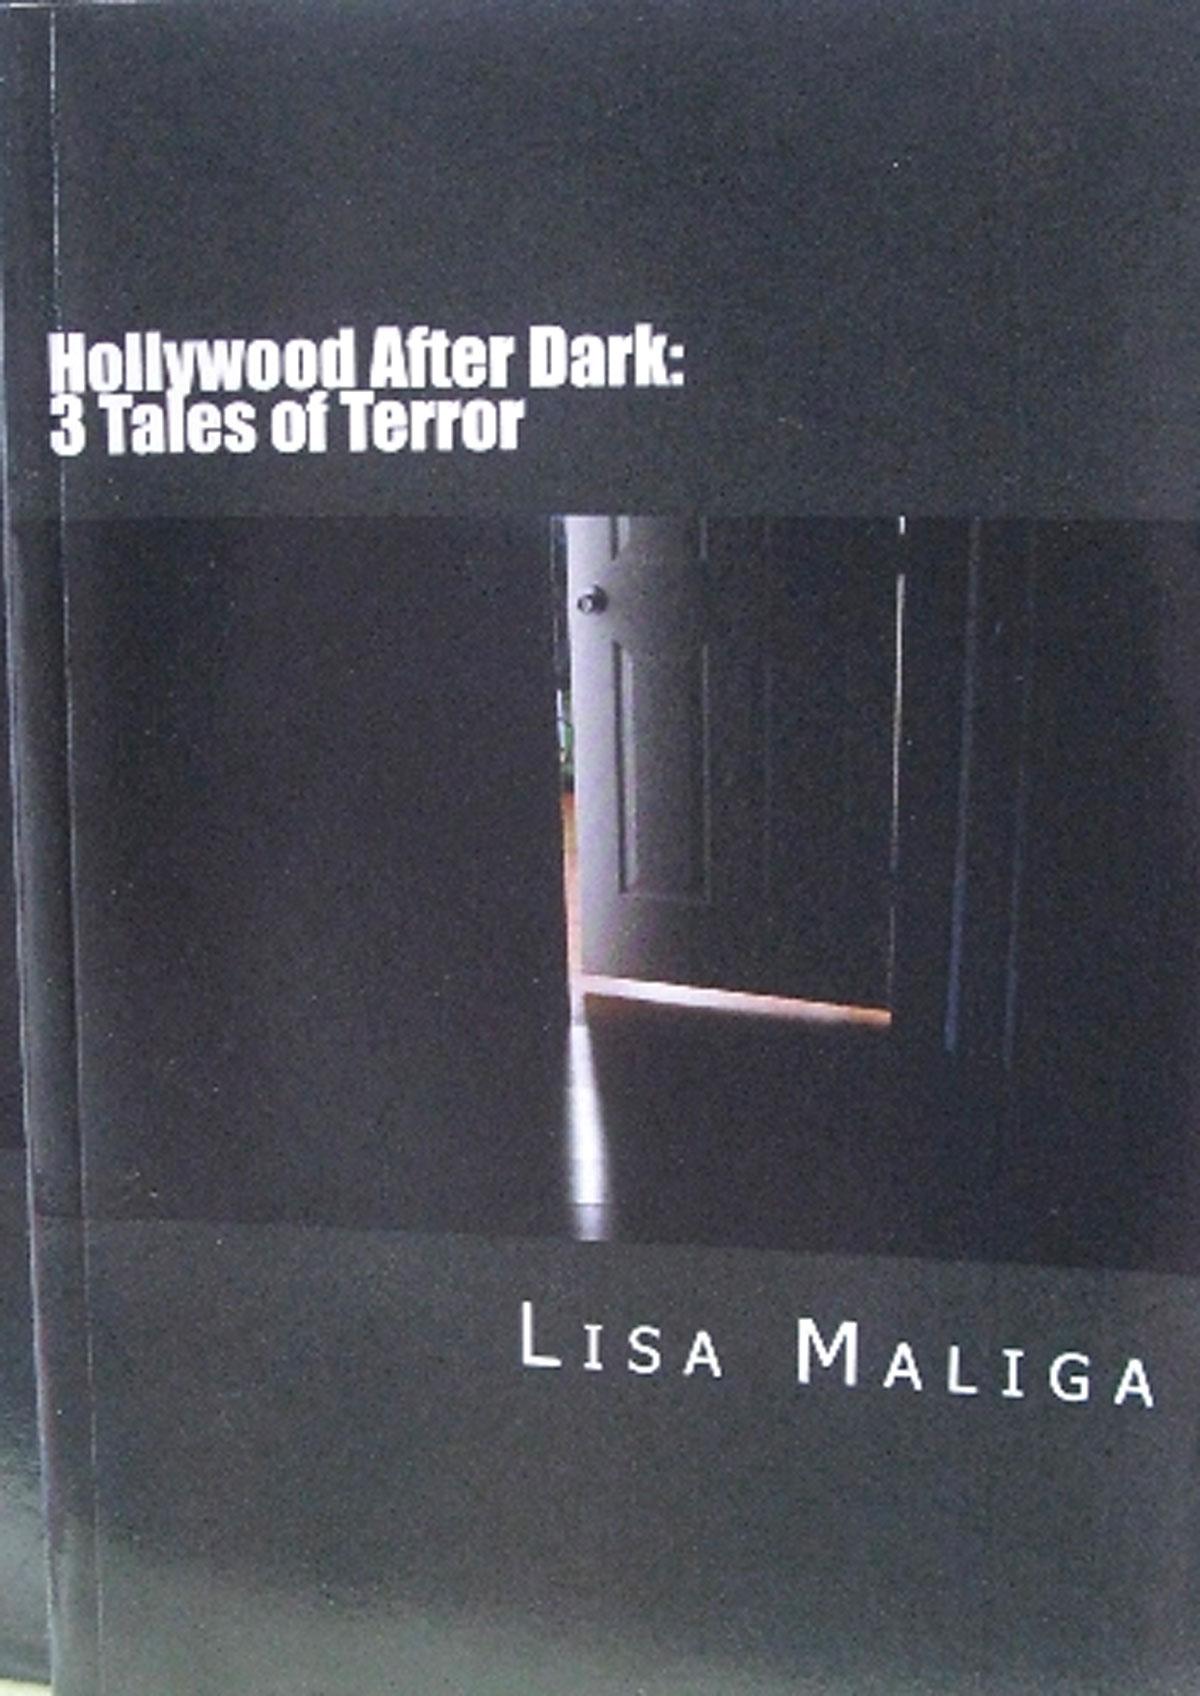 Hollywood-After-Dark.jpg